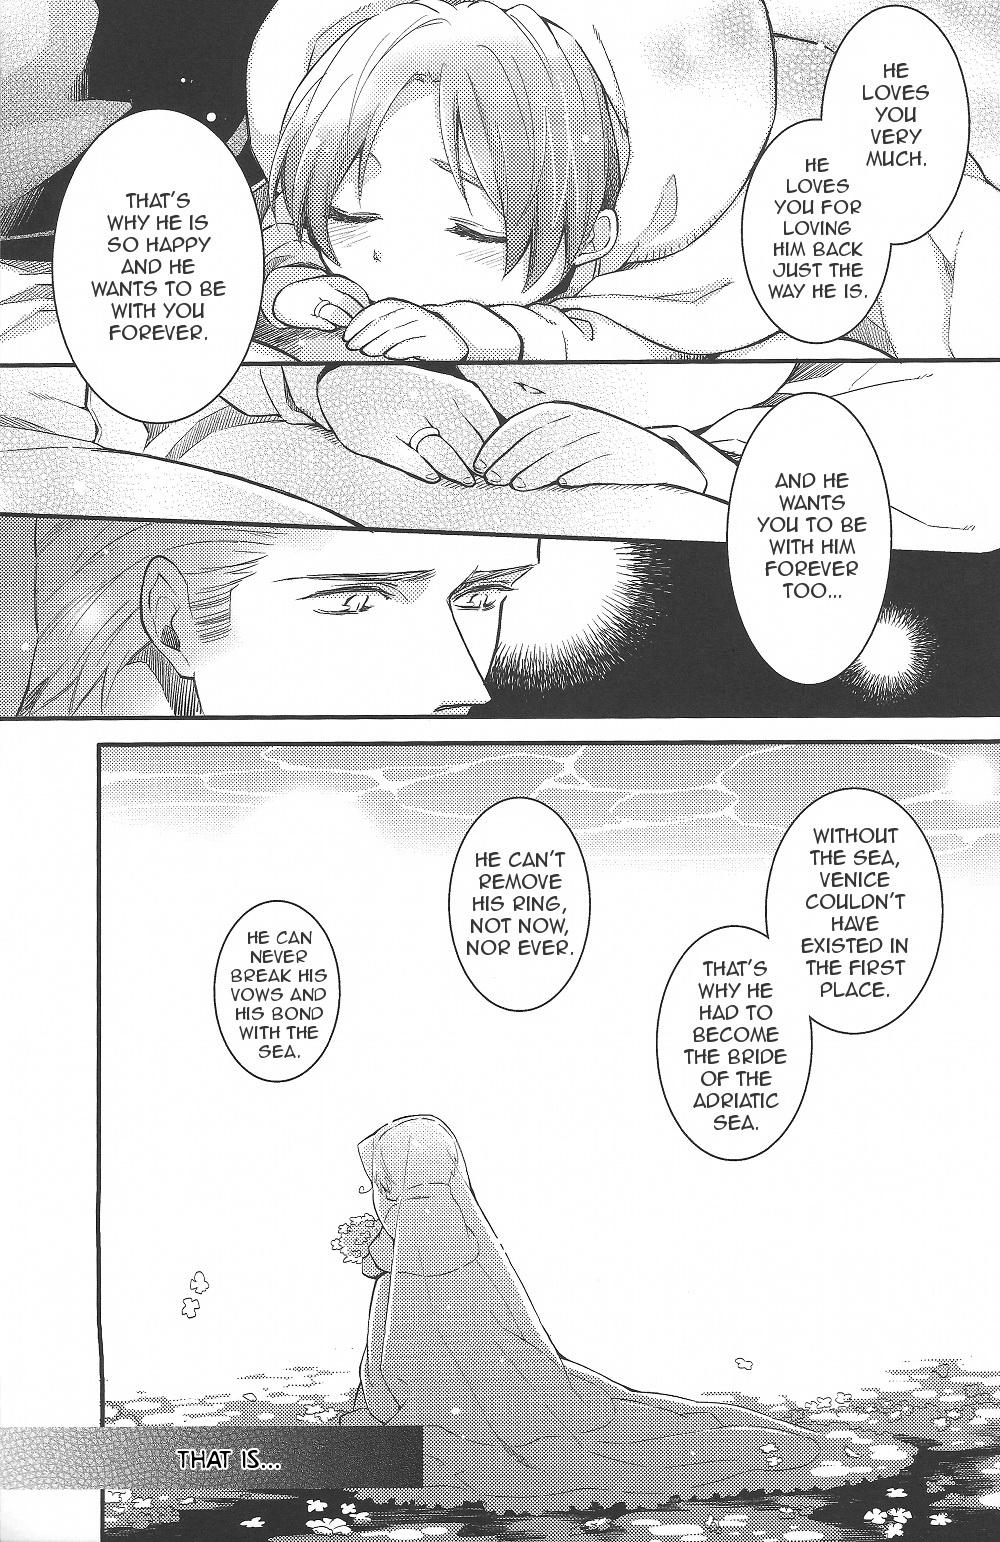 Sposa di Adria chapter 1 page 33